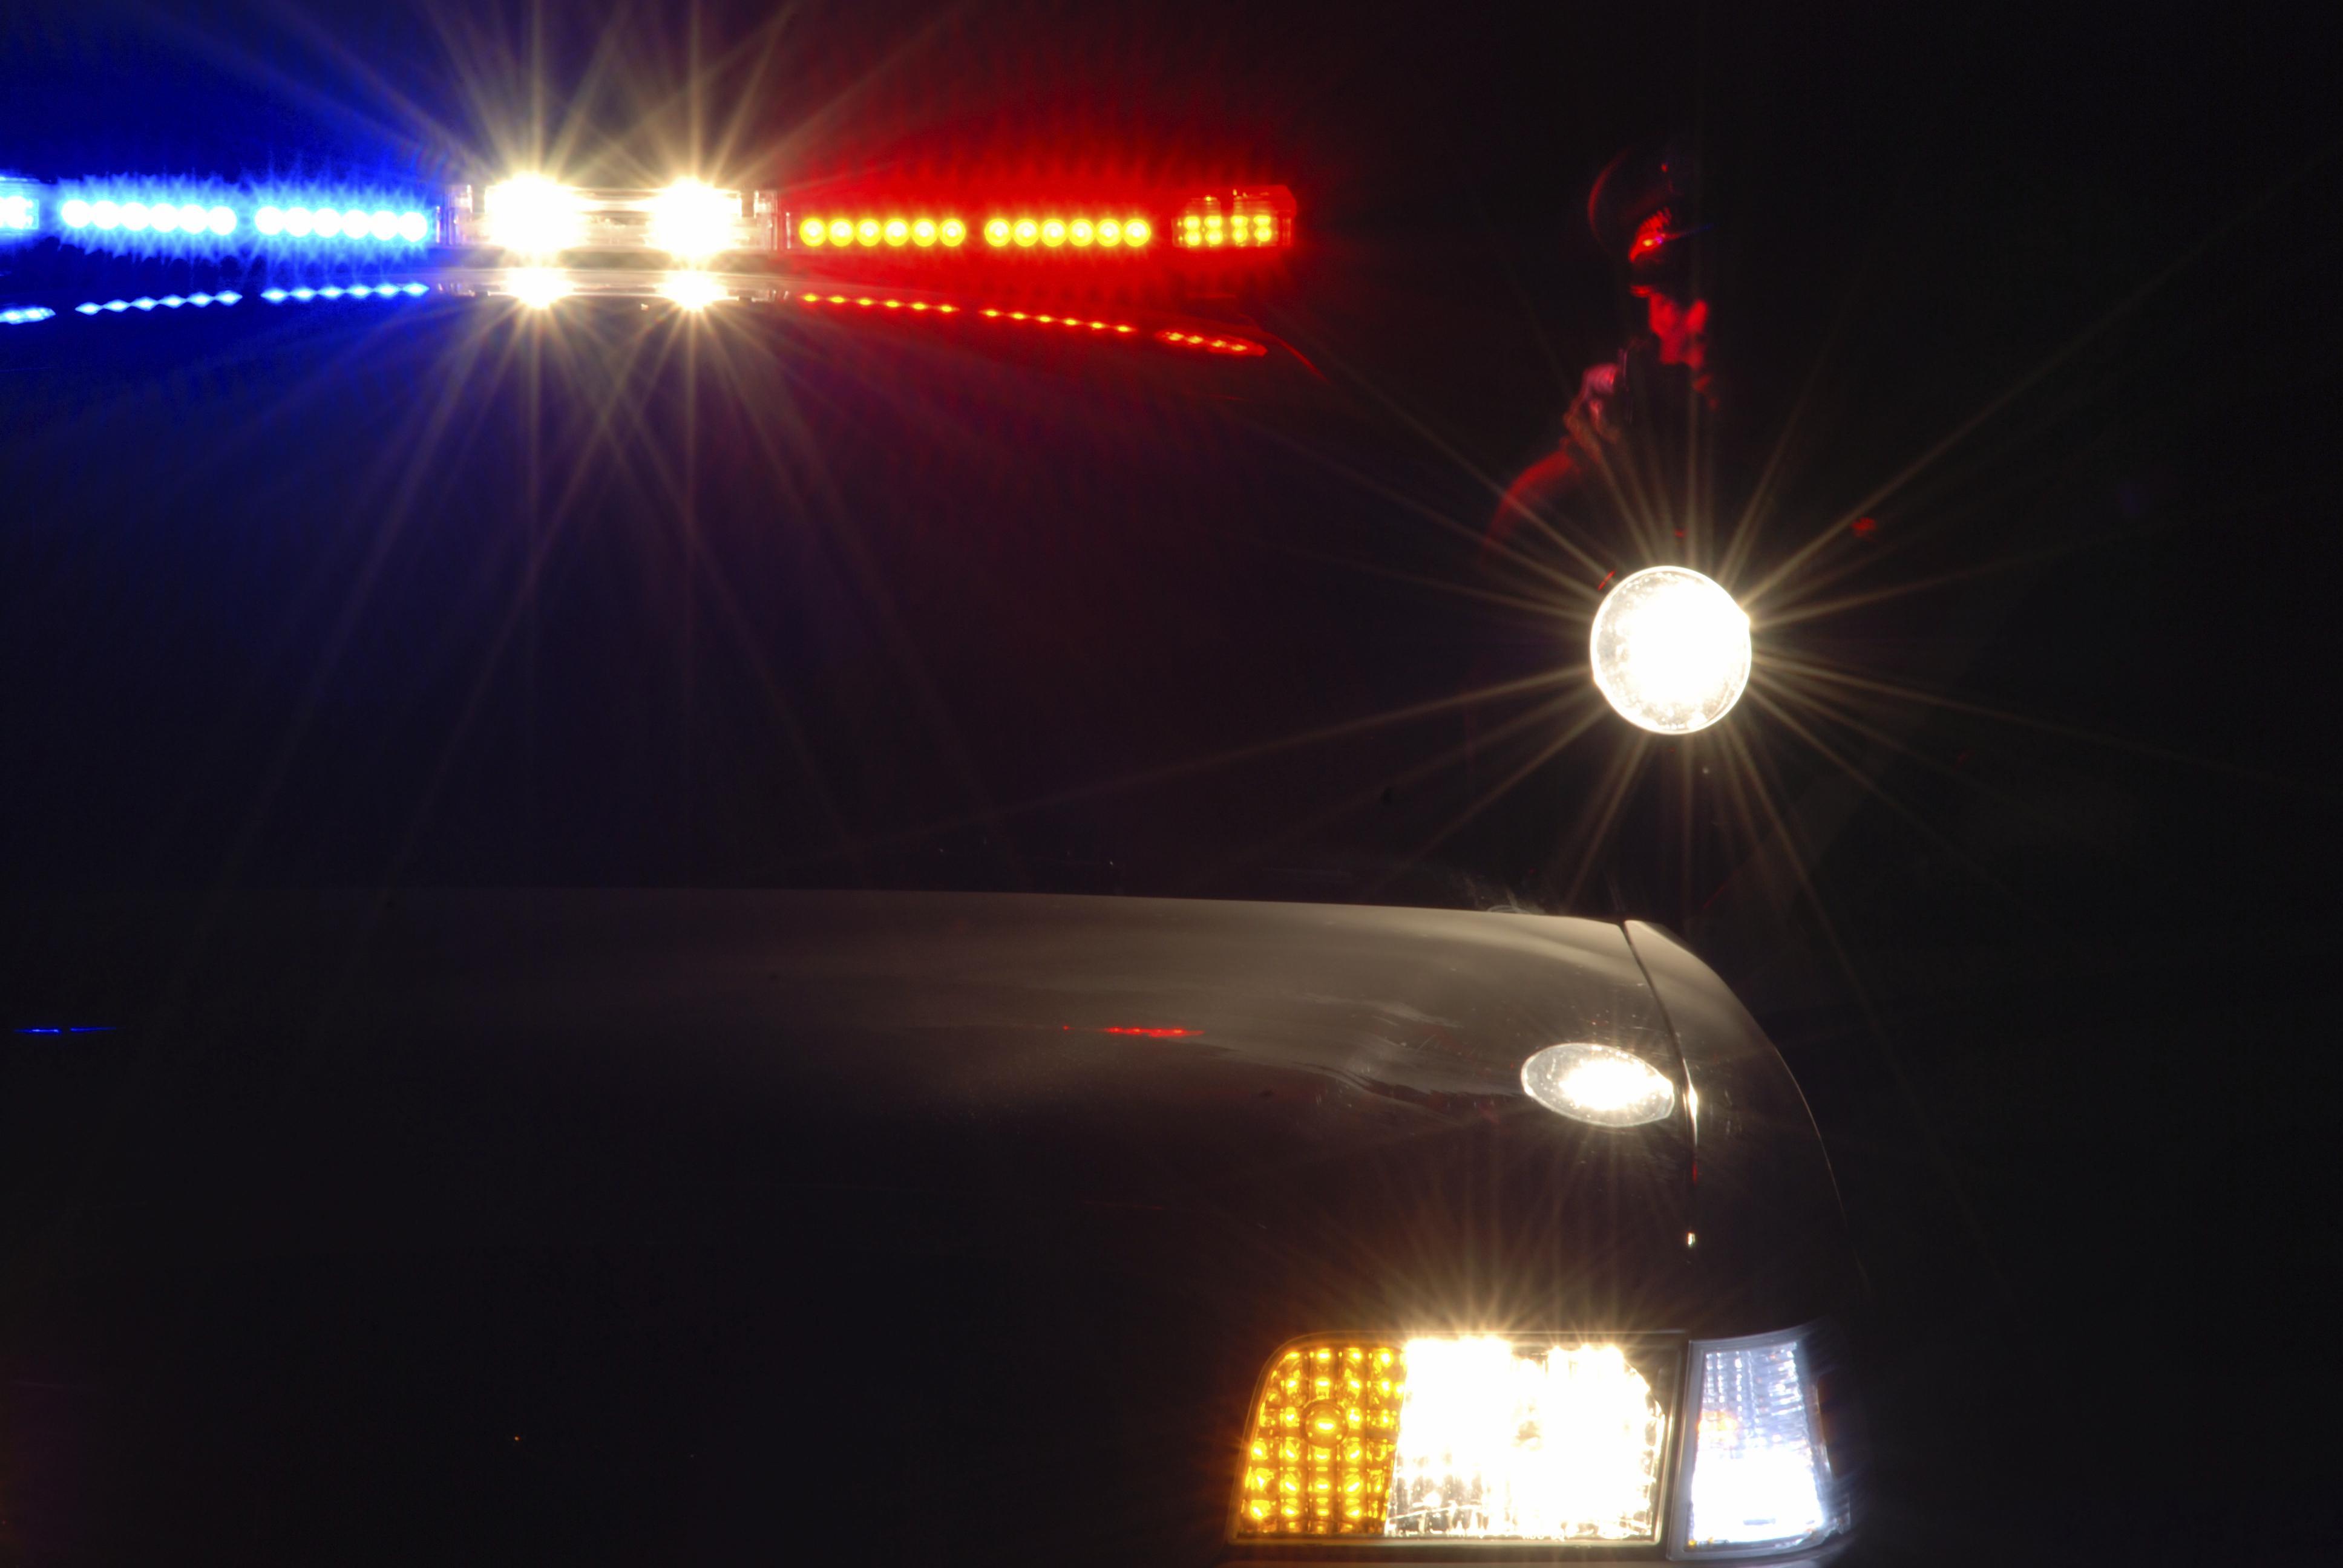 Police authority